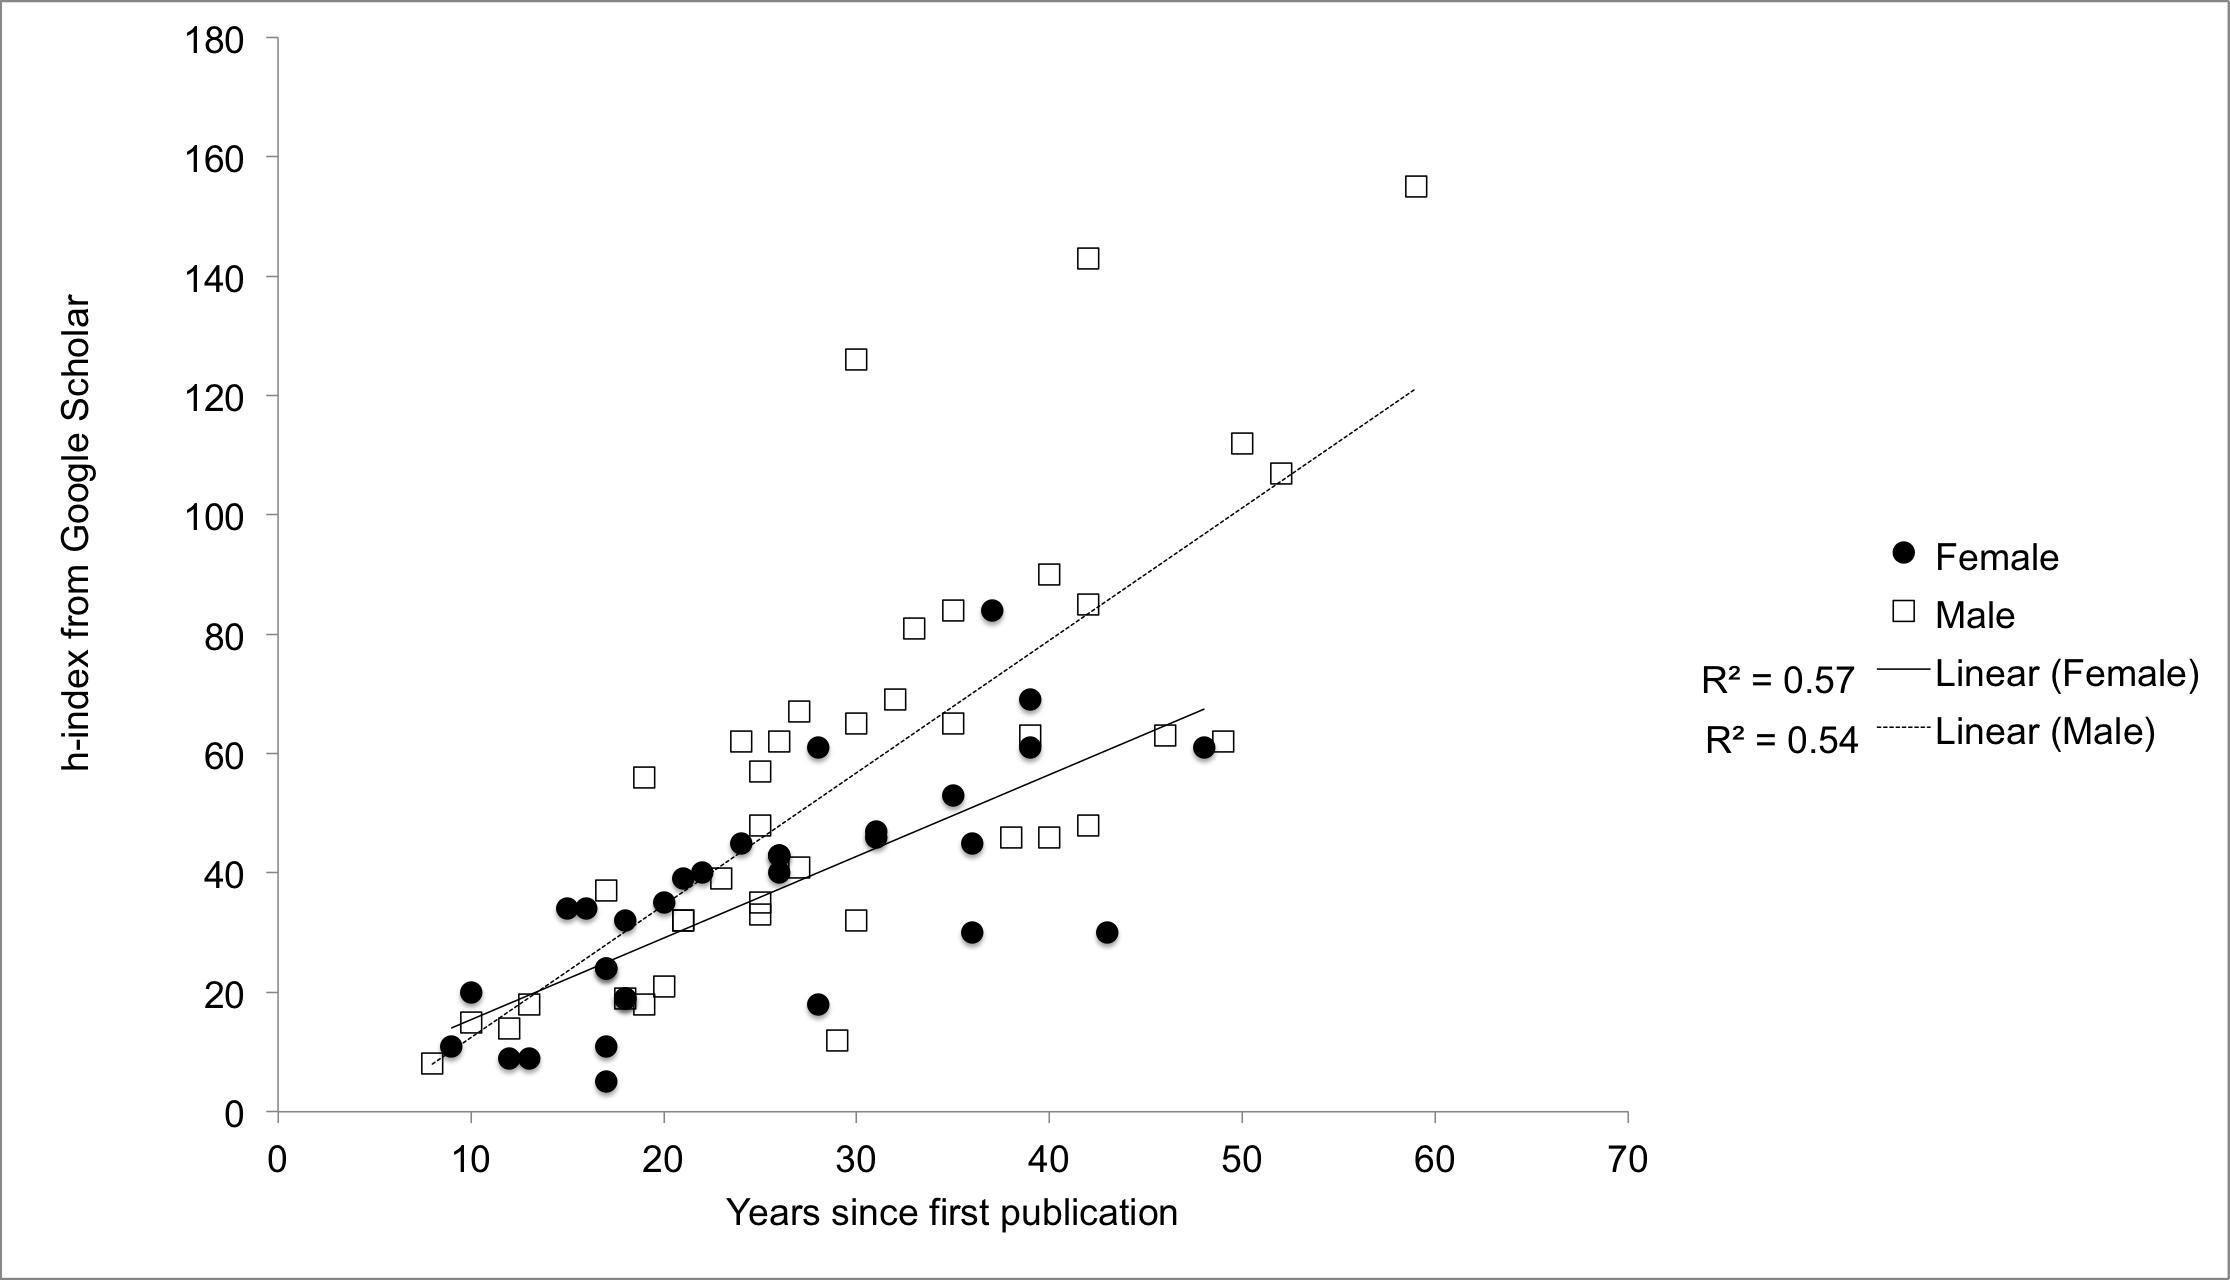 h-index-graph-mf